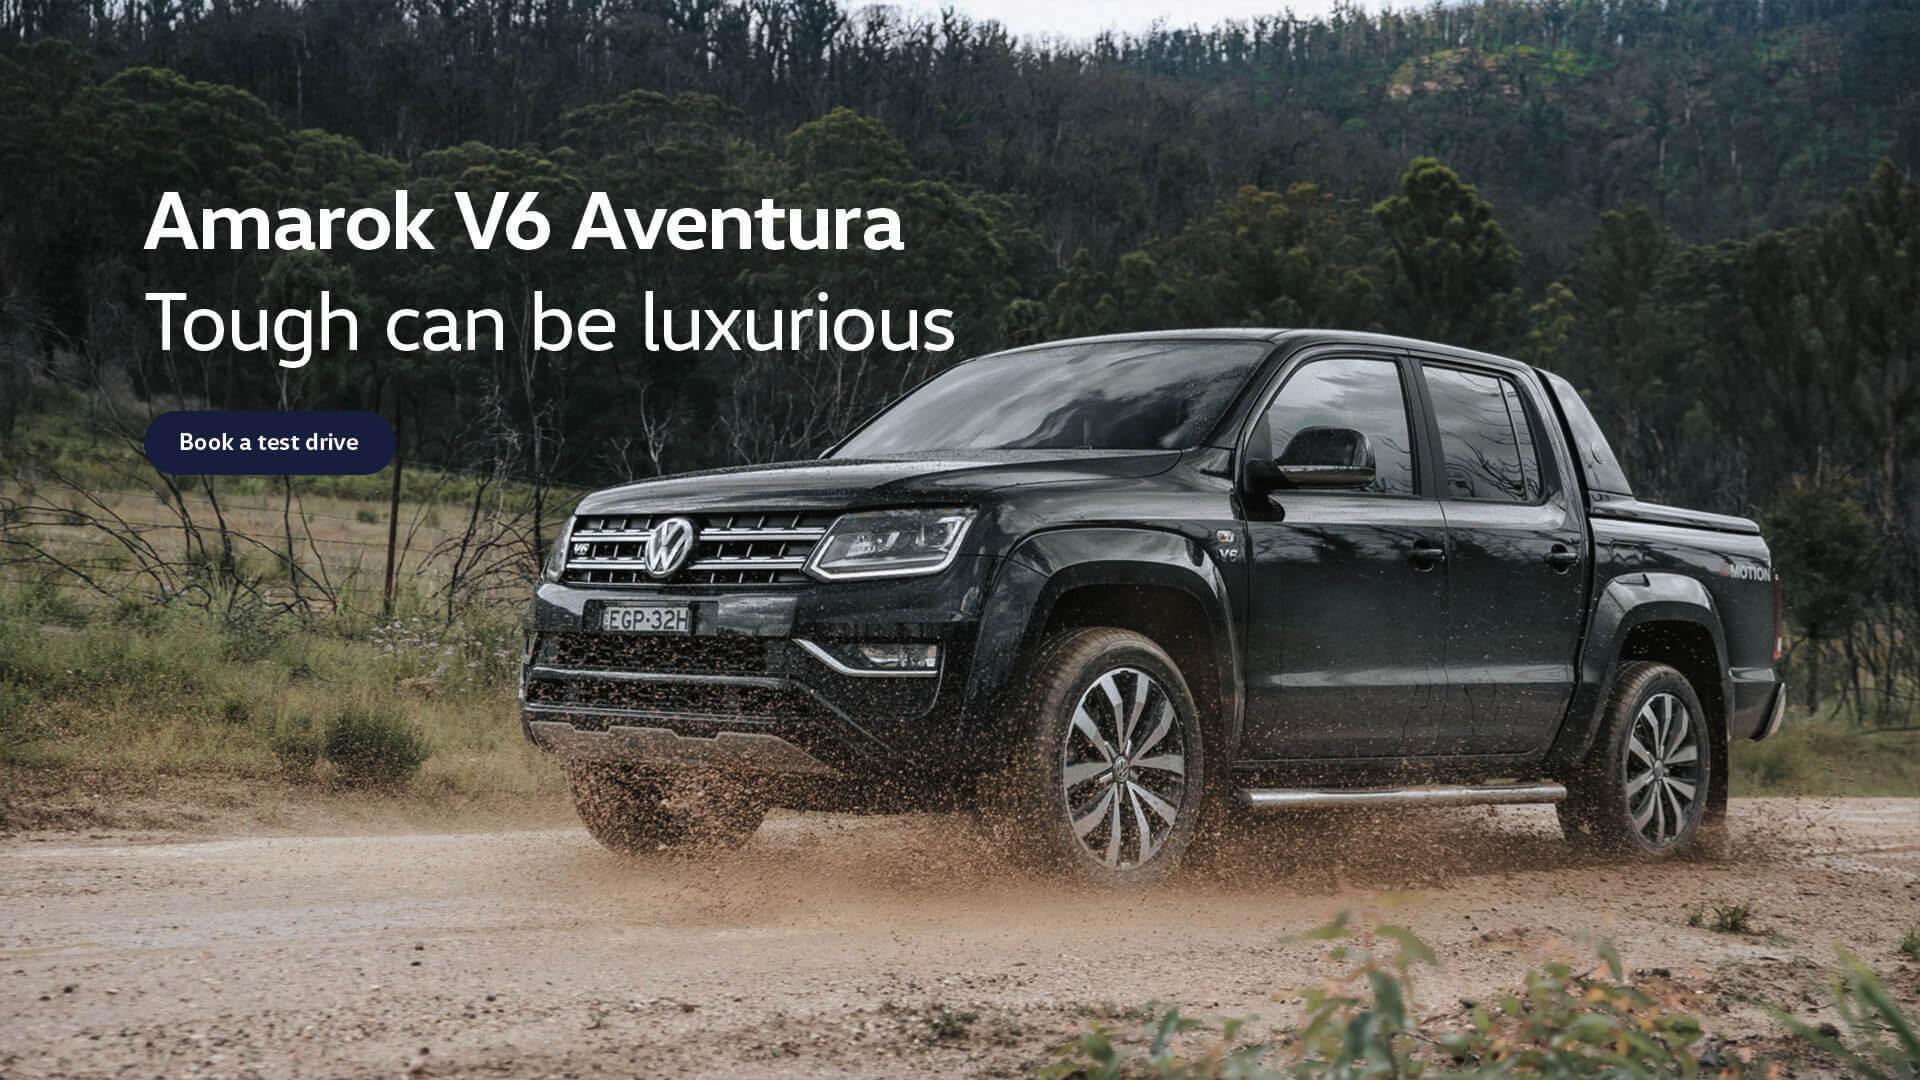 Amarok V6 Aventura. Tough can be luxurious